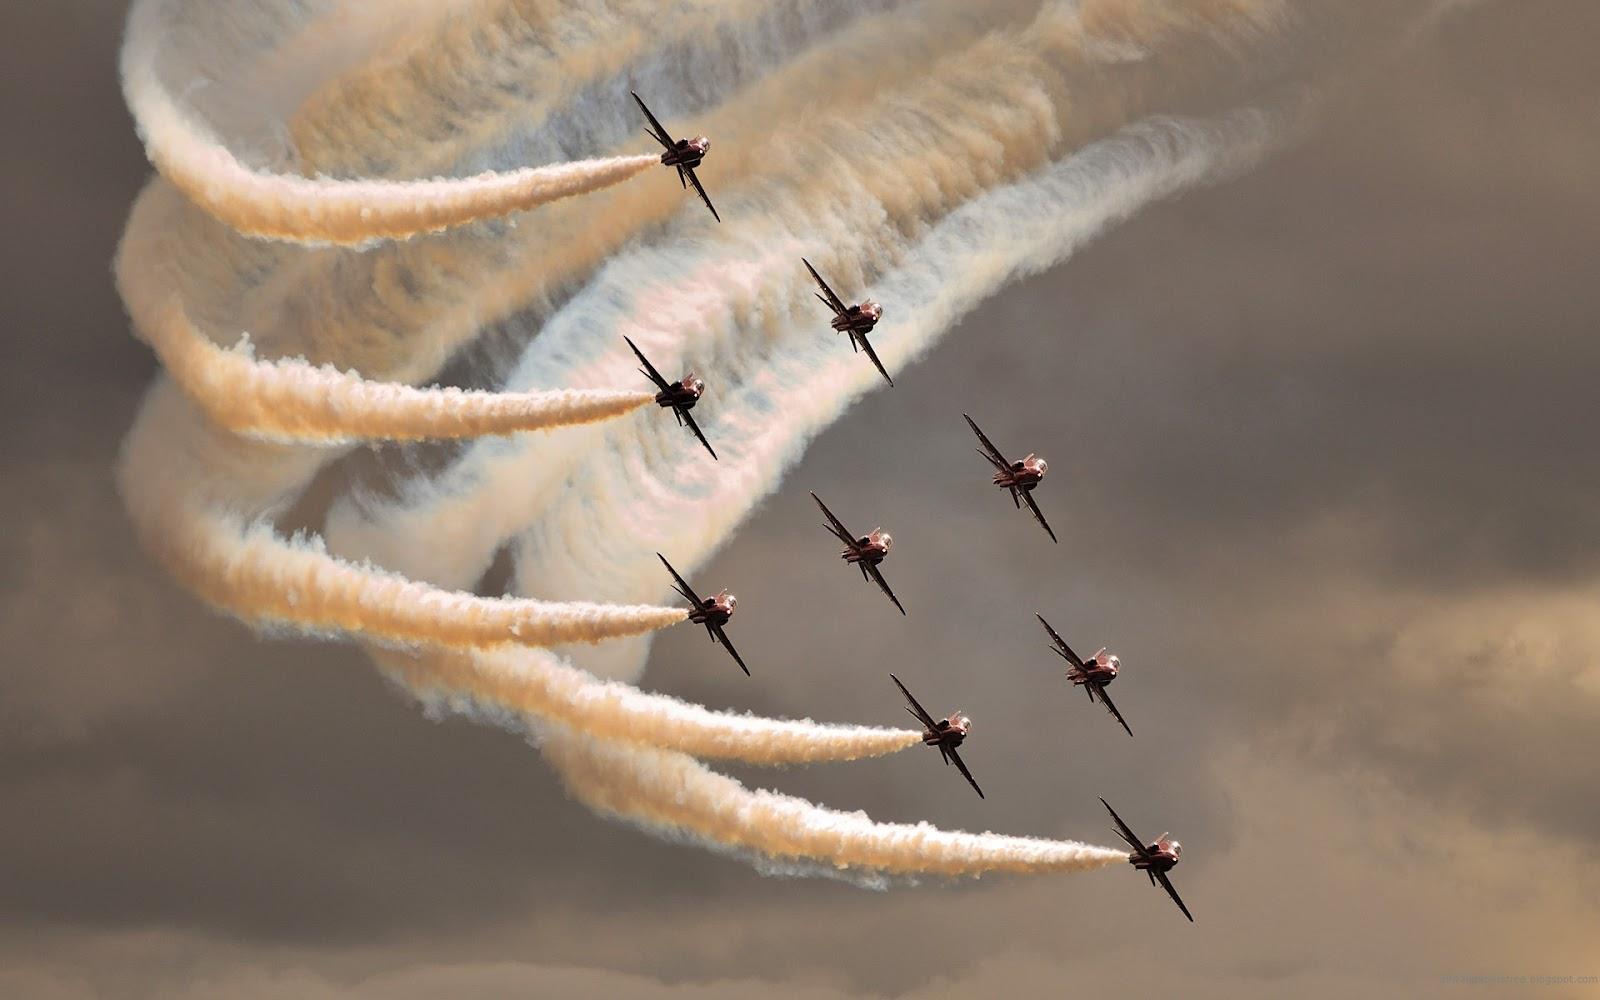 http://3.bp.blogspot.com/-yeOCL8UfUck/T4YSqAEdOkI/AAAAAAAAH3s/90mvbkGPA14/s1600/acrobatic_aero_l139_albatros.jpg